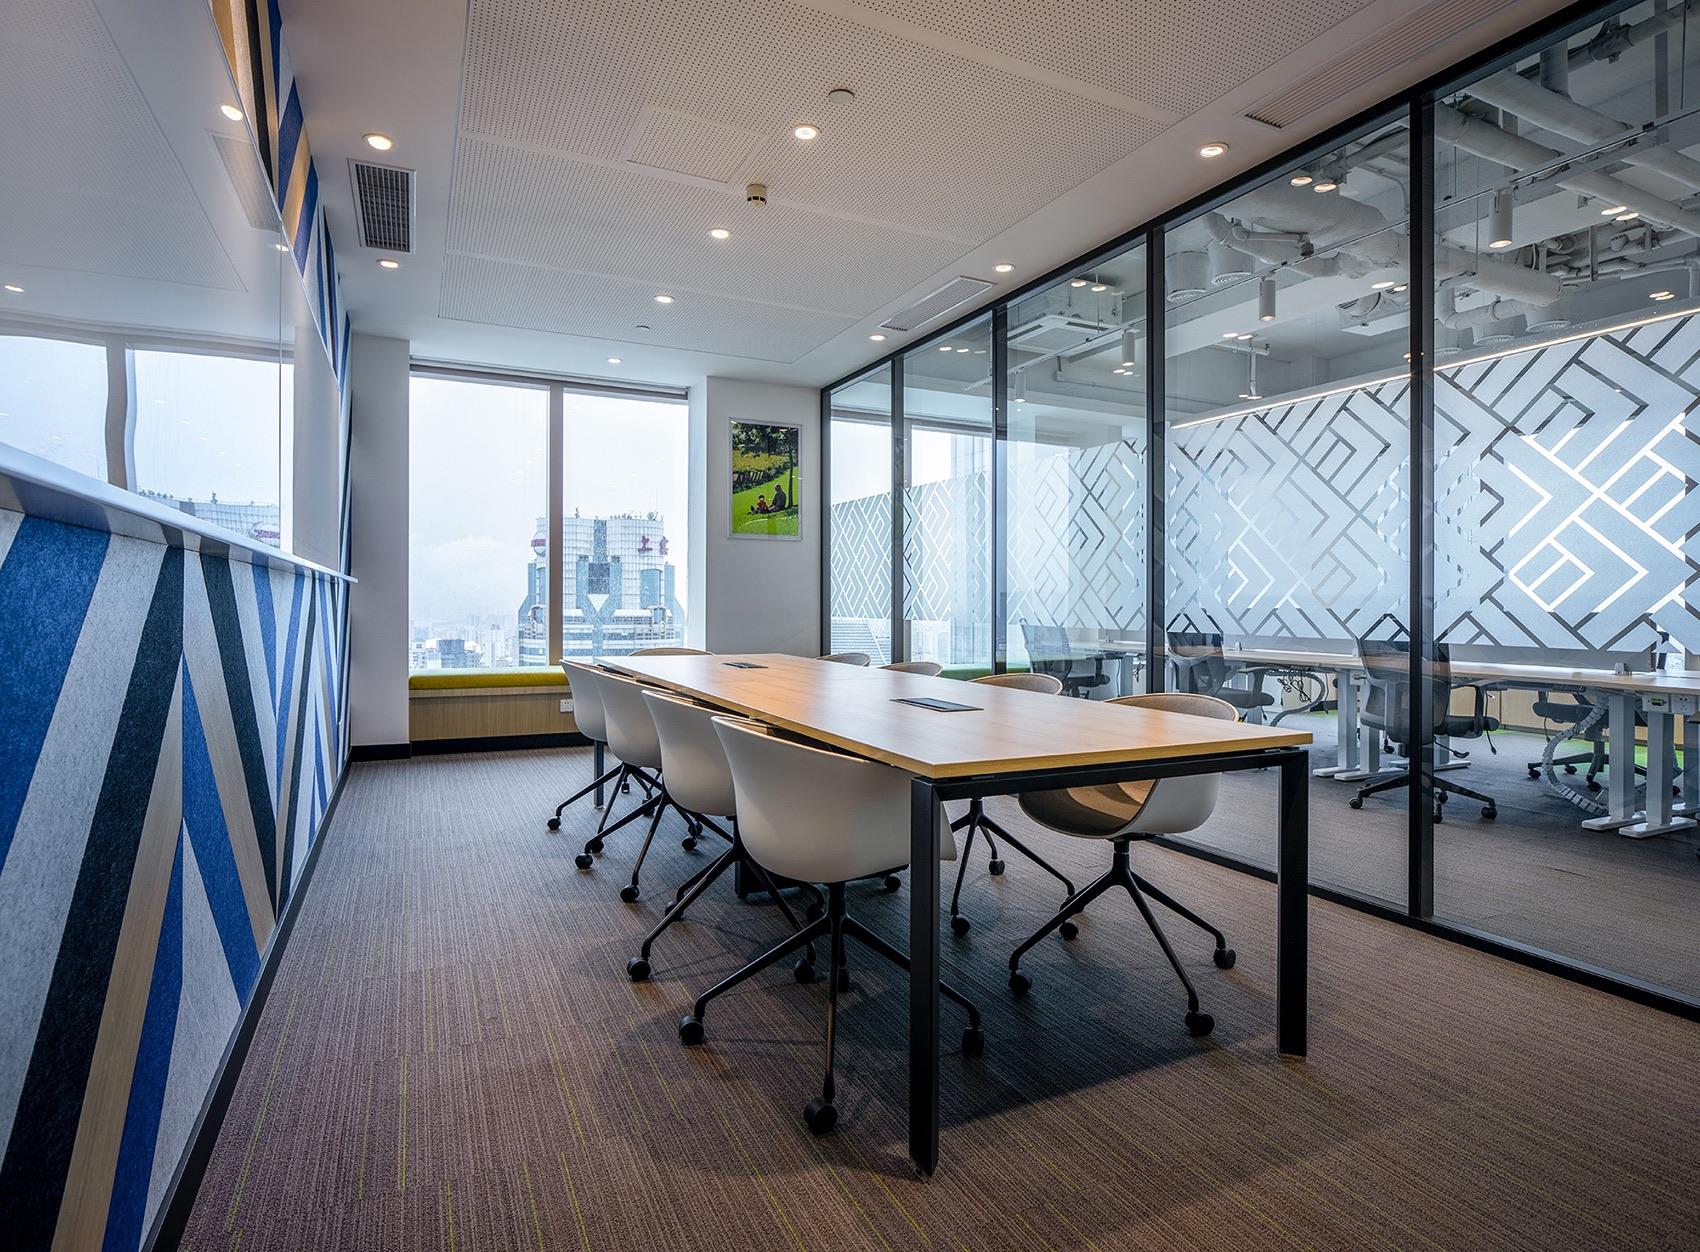 zespri-image-shanghai-office-10